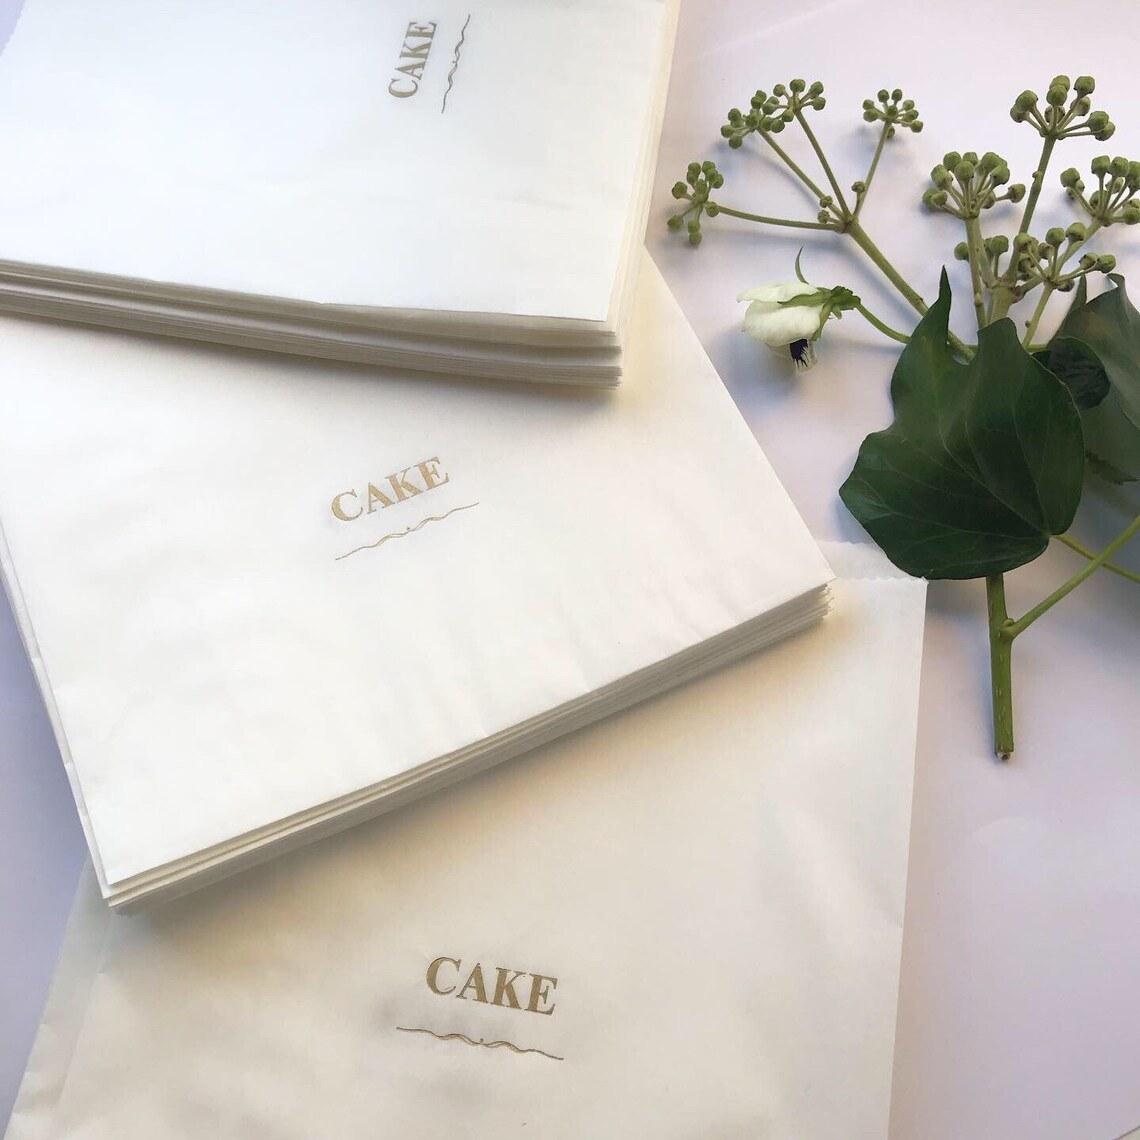 bags that say cake